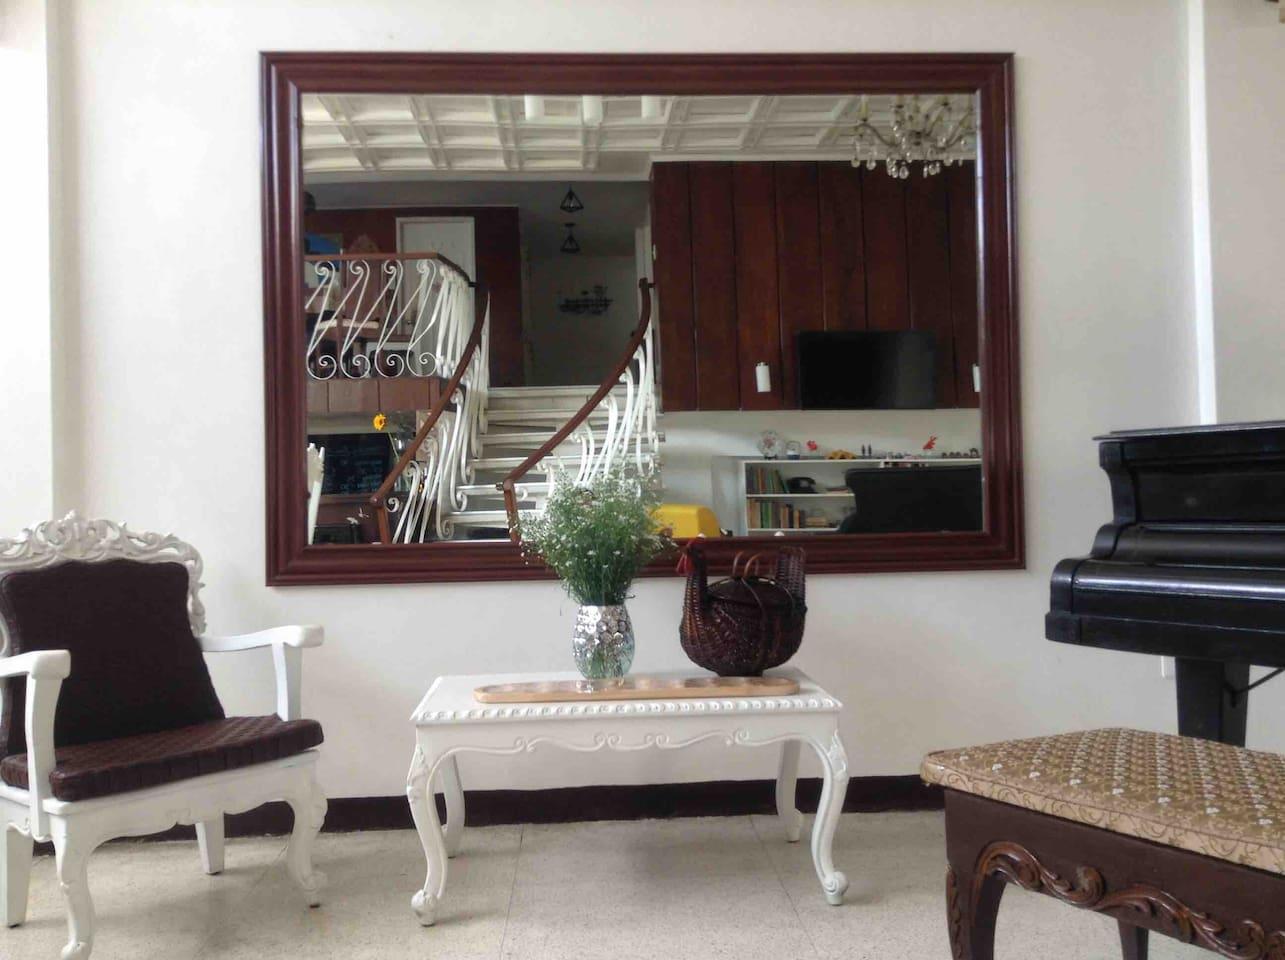 Terrace House on Mayon Av:  Mezzanine with 3 rooms